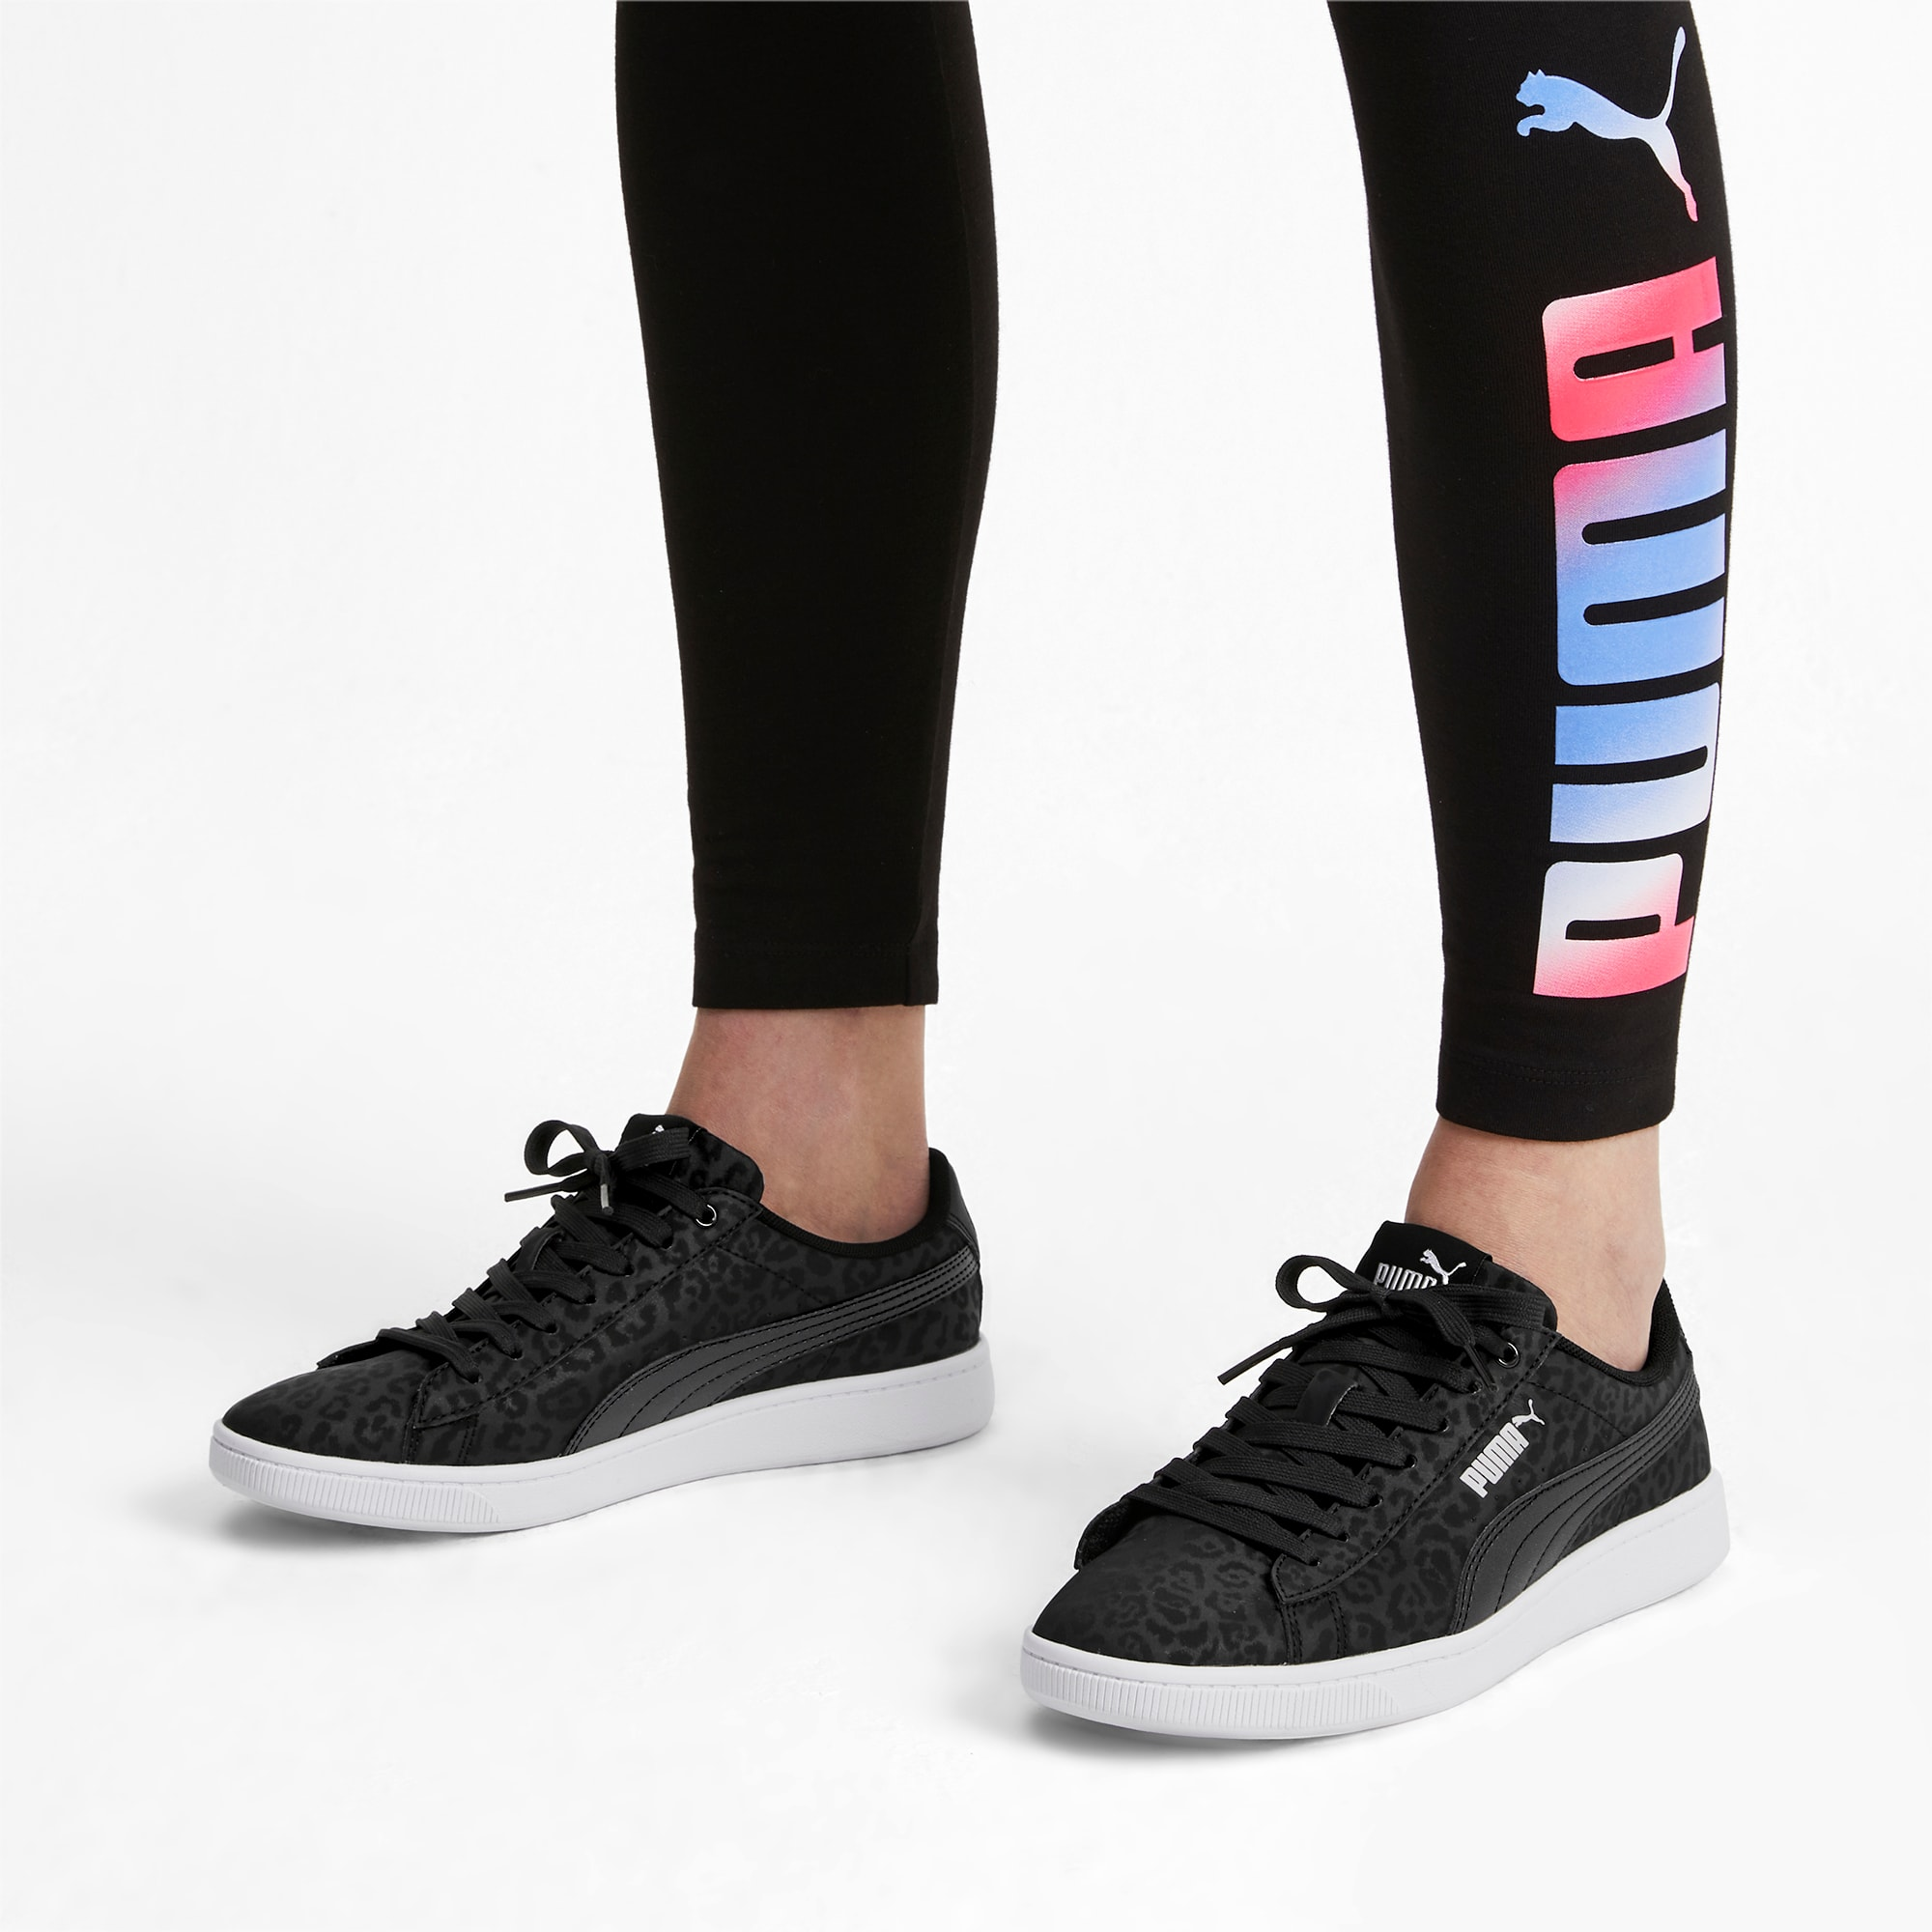 PUMA Vikky v2 Wildcat Women's Sneakers